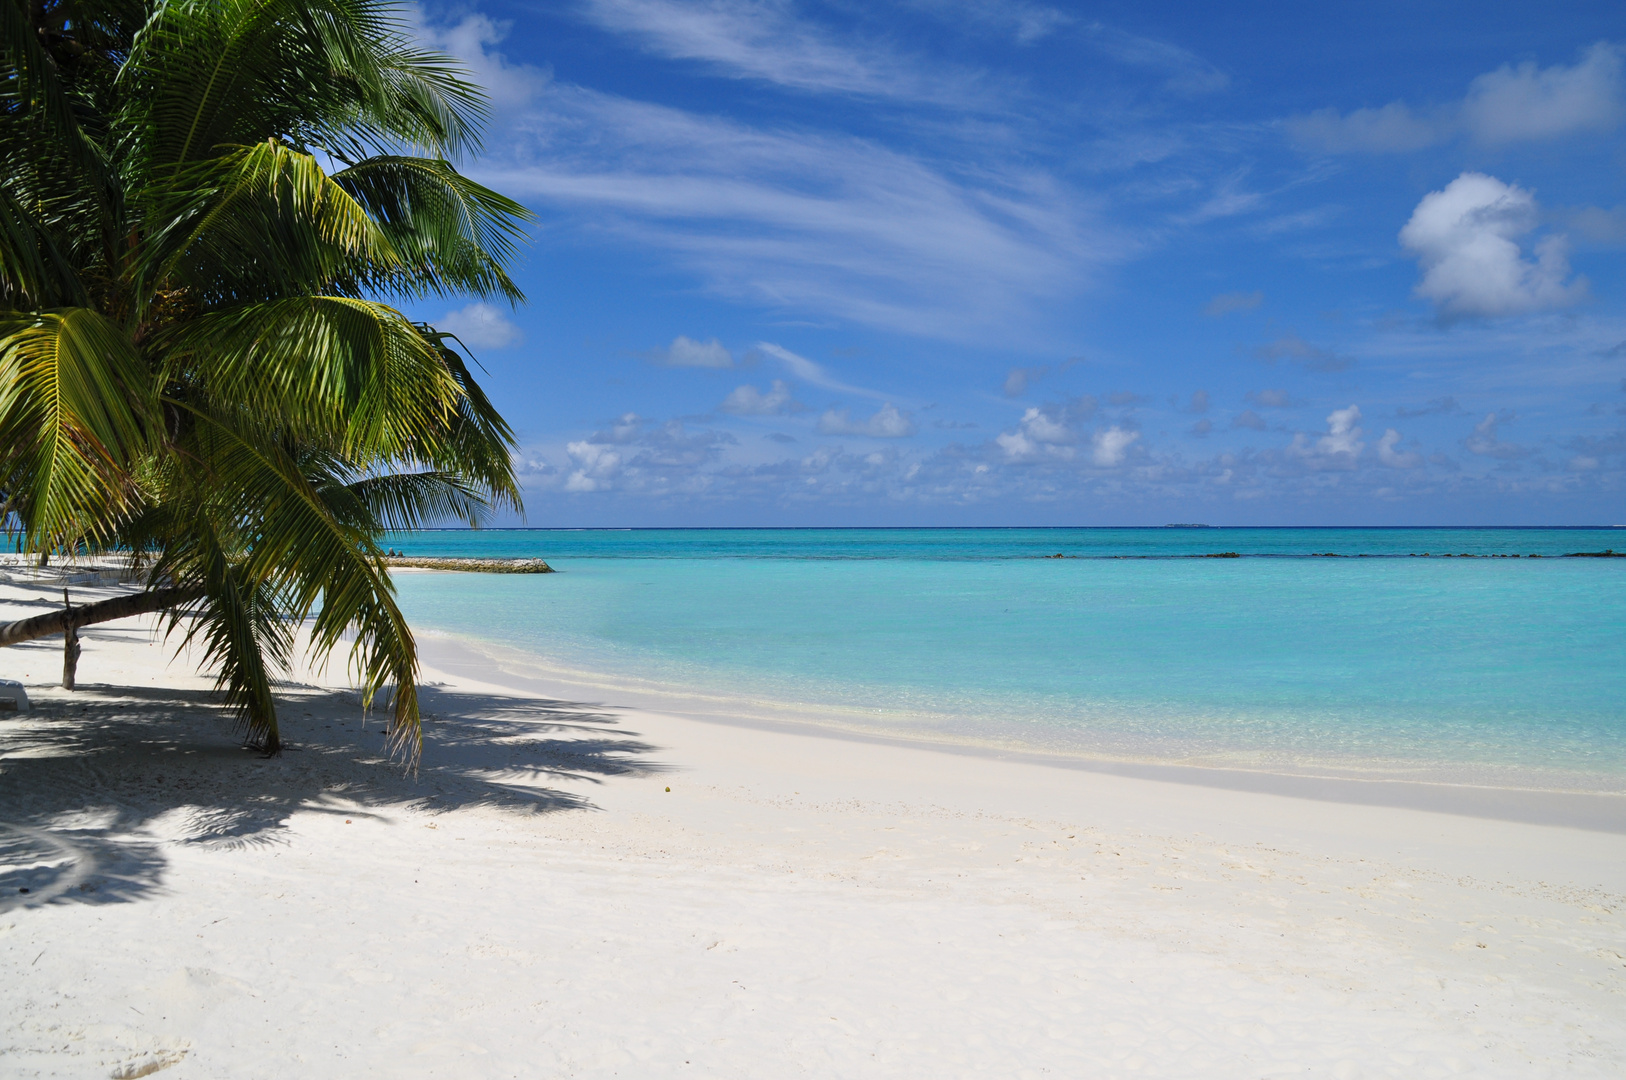 strand malediven summer island village foto bild landschaft meer strand natur bilder auf. Black Bedroom Furniture Sets. Home Design Ideas